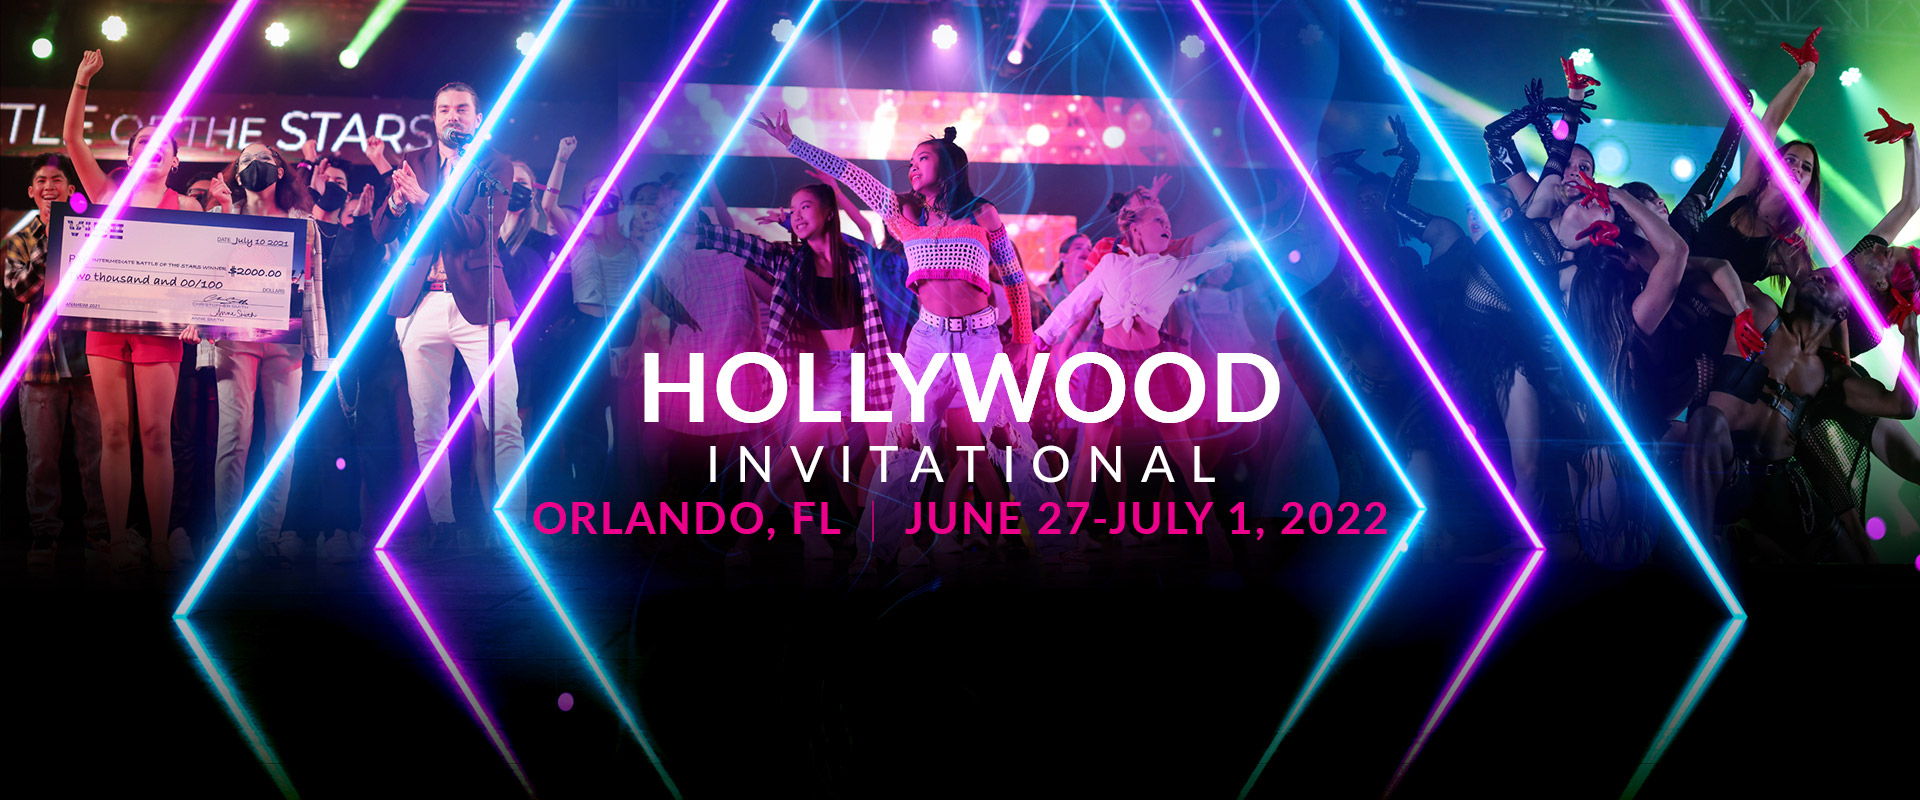 Hollywood Vibe 2022 Hollywood Invitational Orlando FL